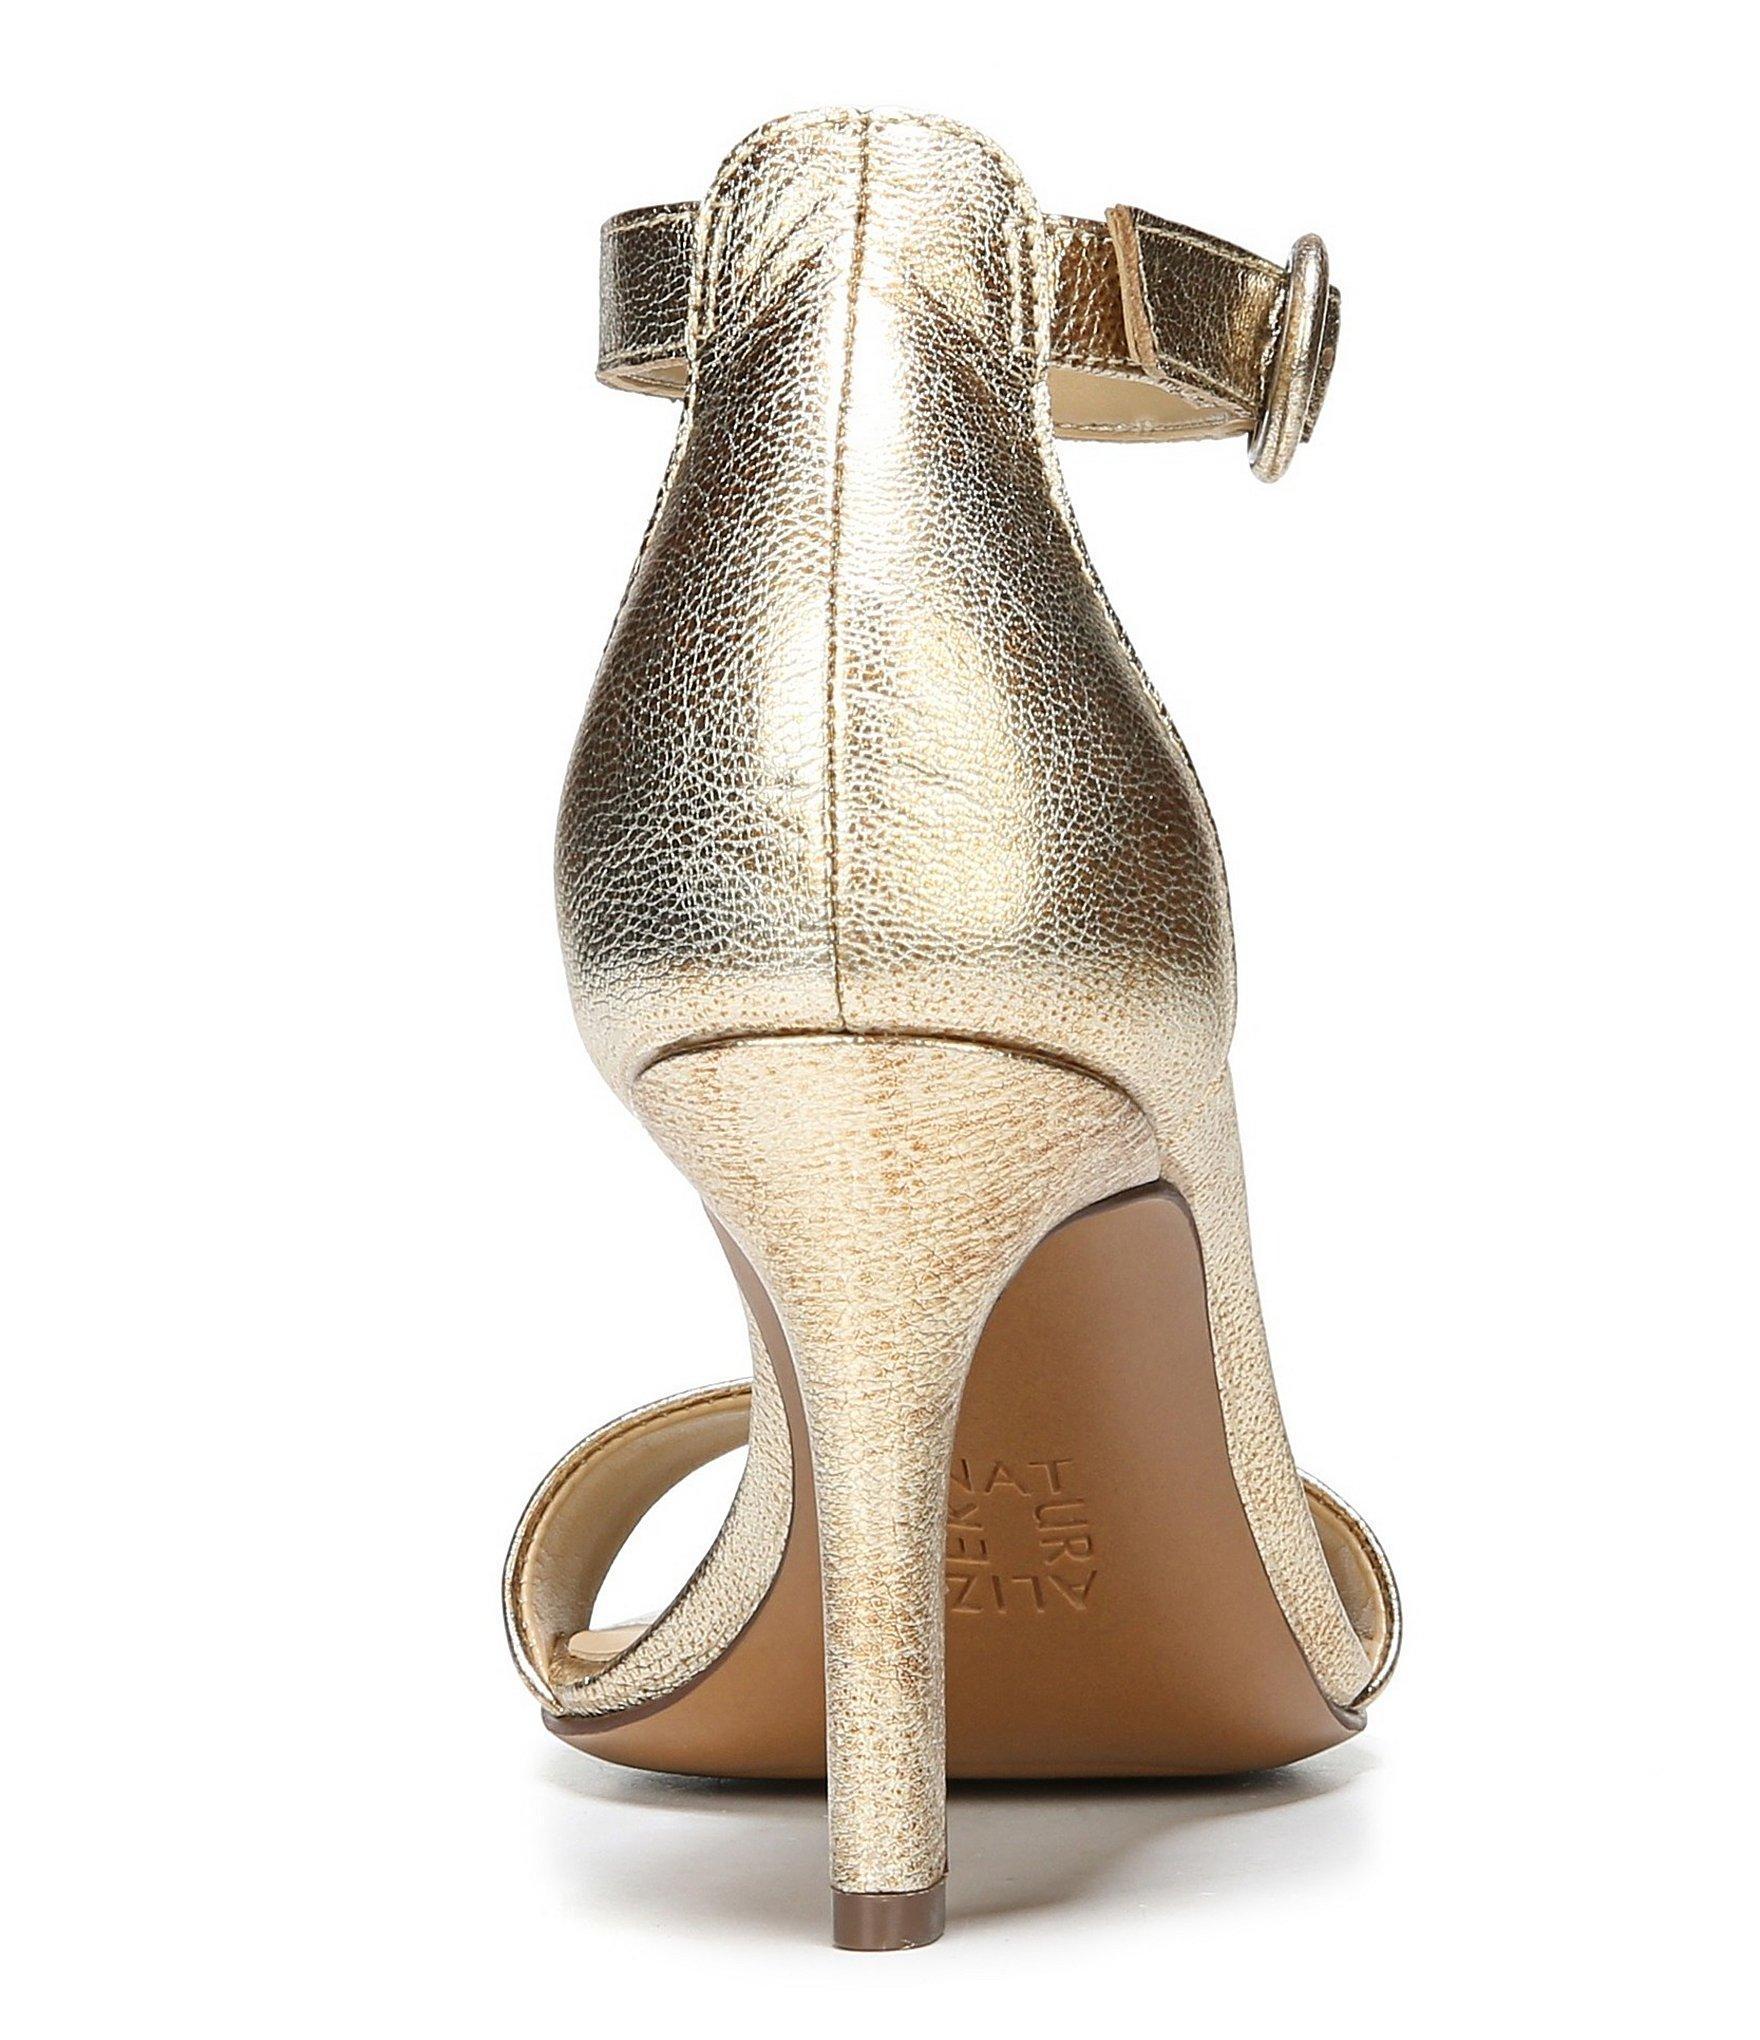 324b75edfa65 Naturalizer - Natural Kinsley Ankle Strap Dress Sandals - Lyst. View  fullscreen